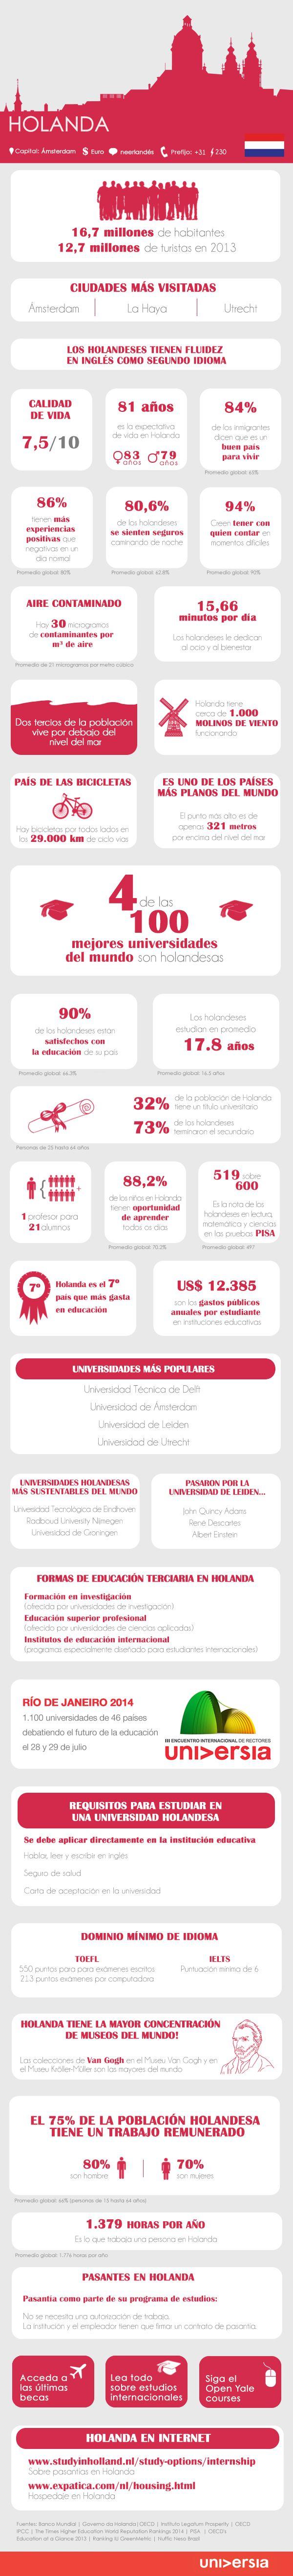 Infografía: más de 30 datos que debes conocer para estudiar o trabajar en Holanda vía: http://noticias.universia.net.mx